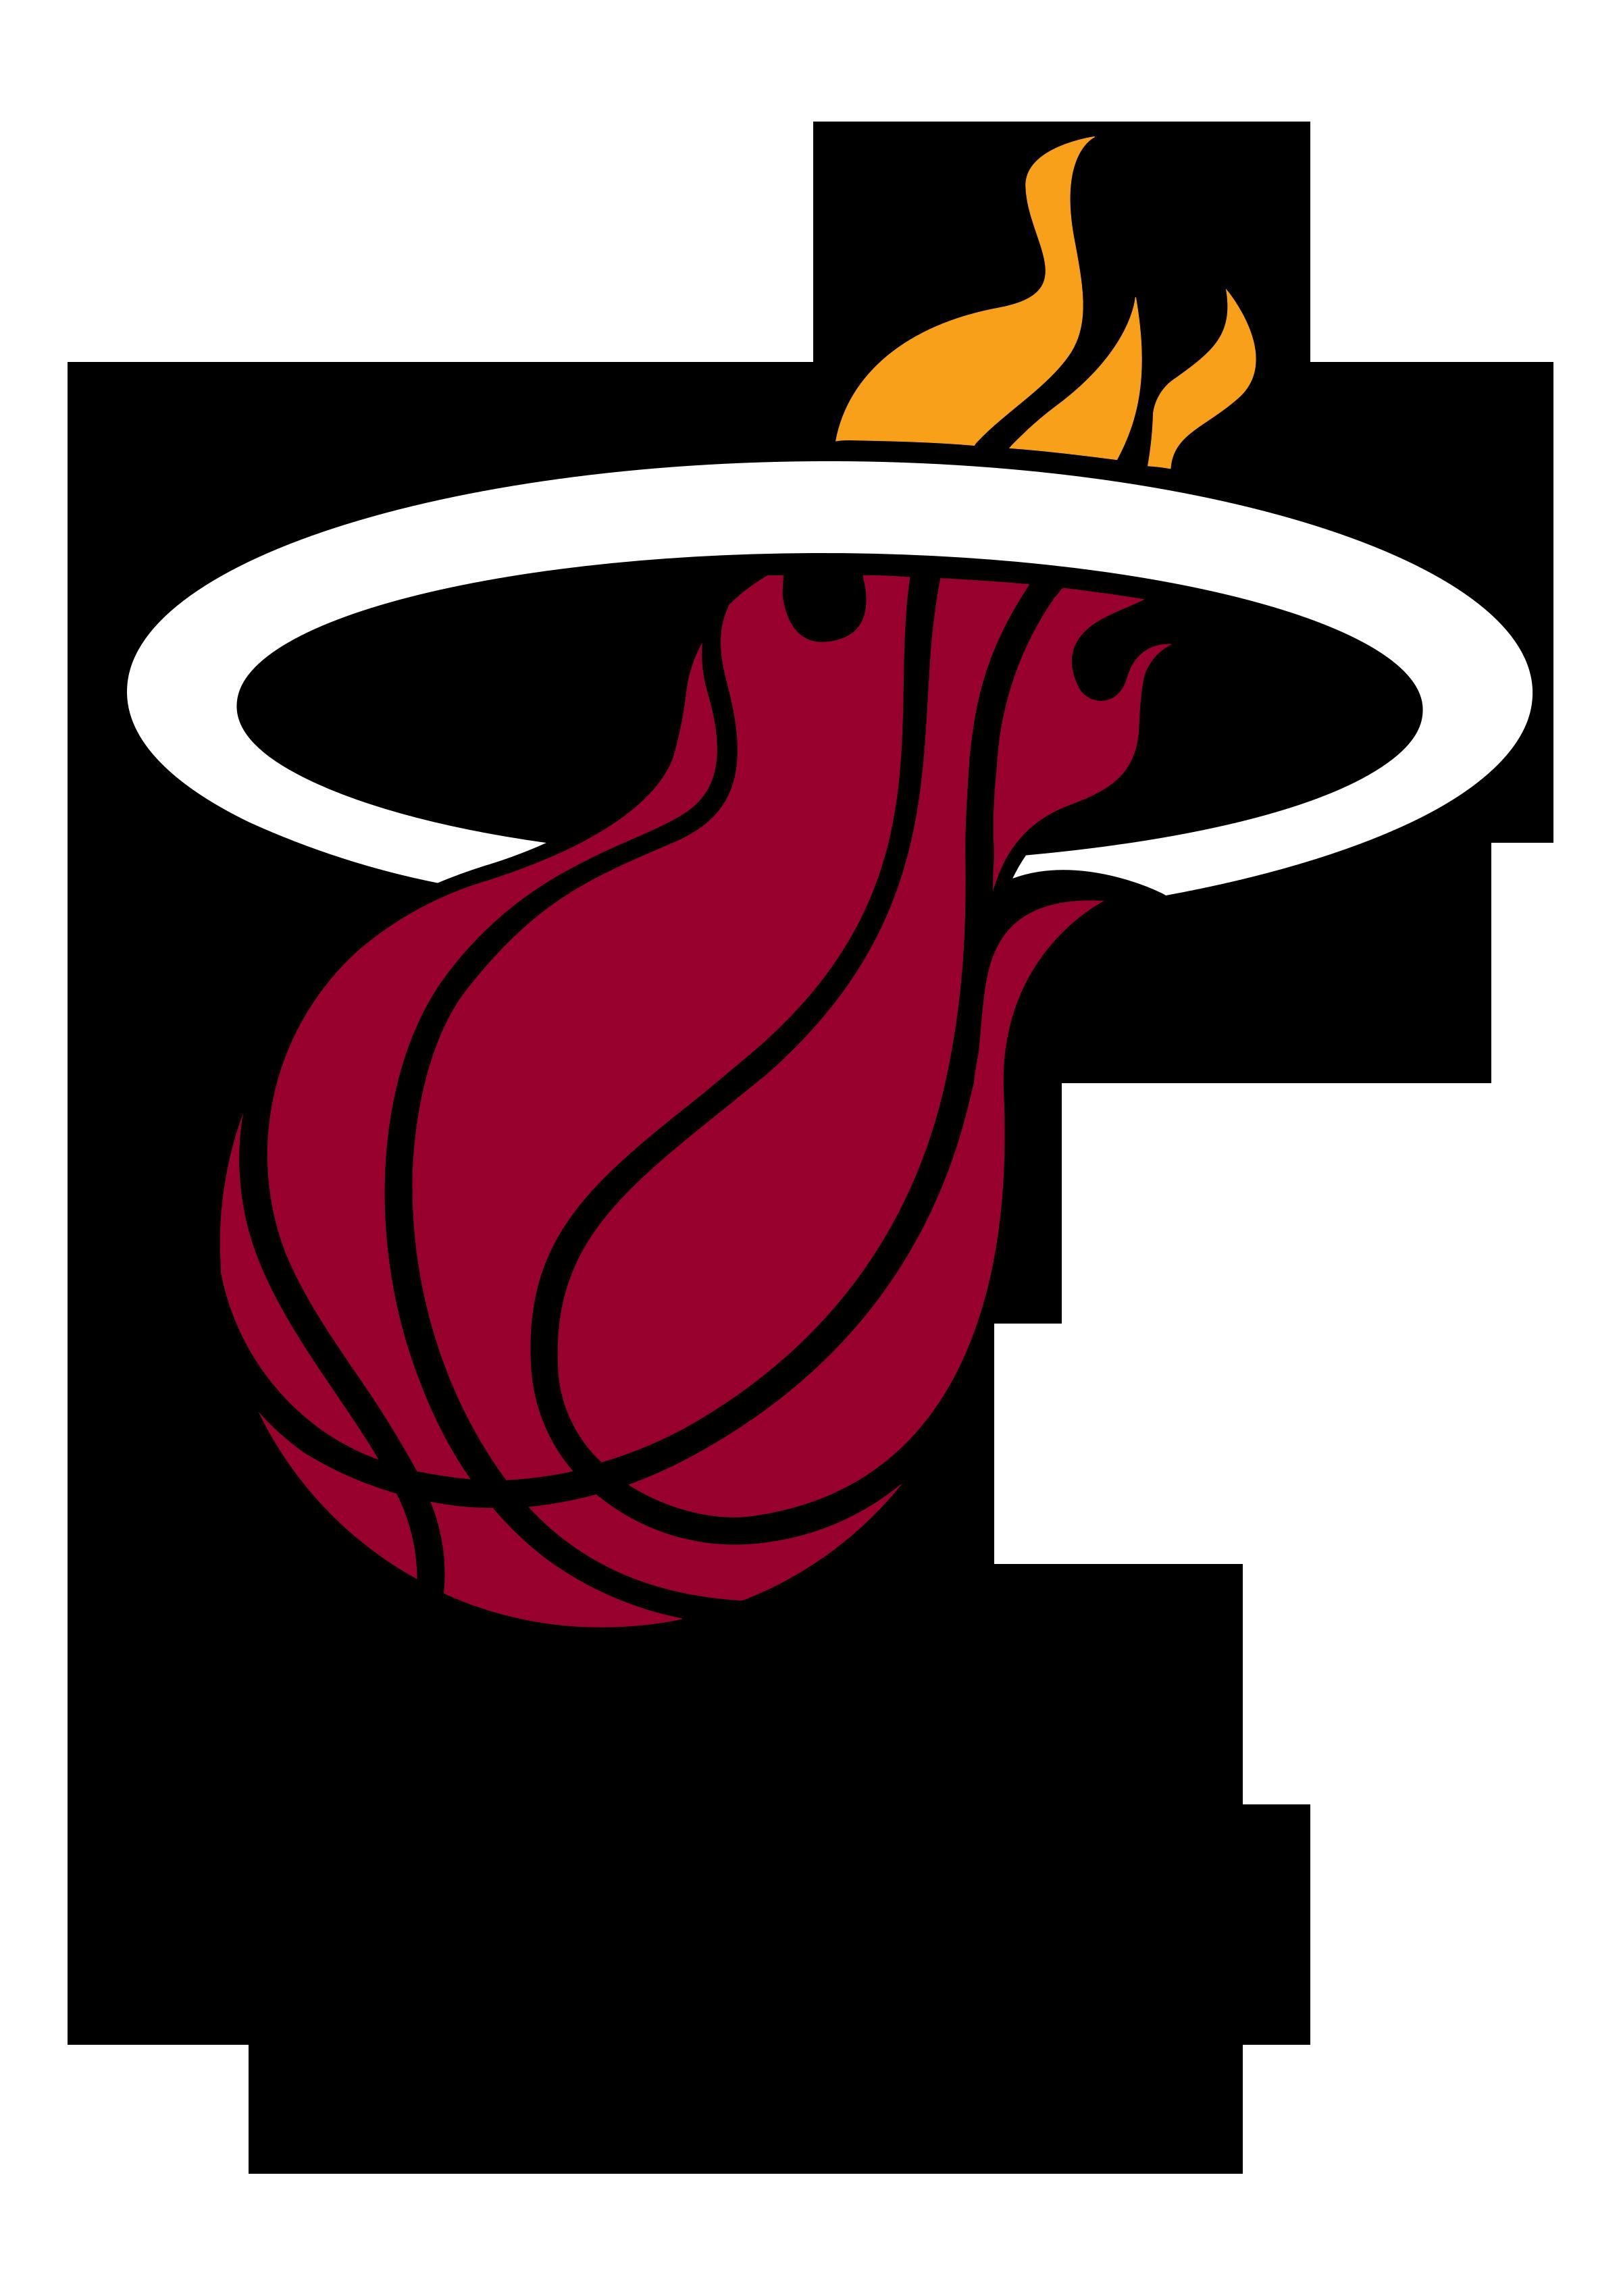 png library Heat drawing. Miami logo at getdrawings.